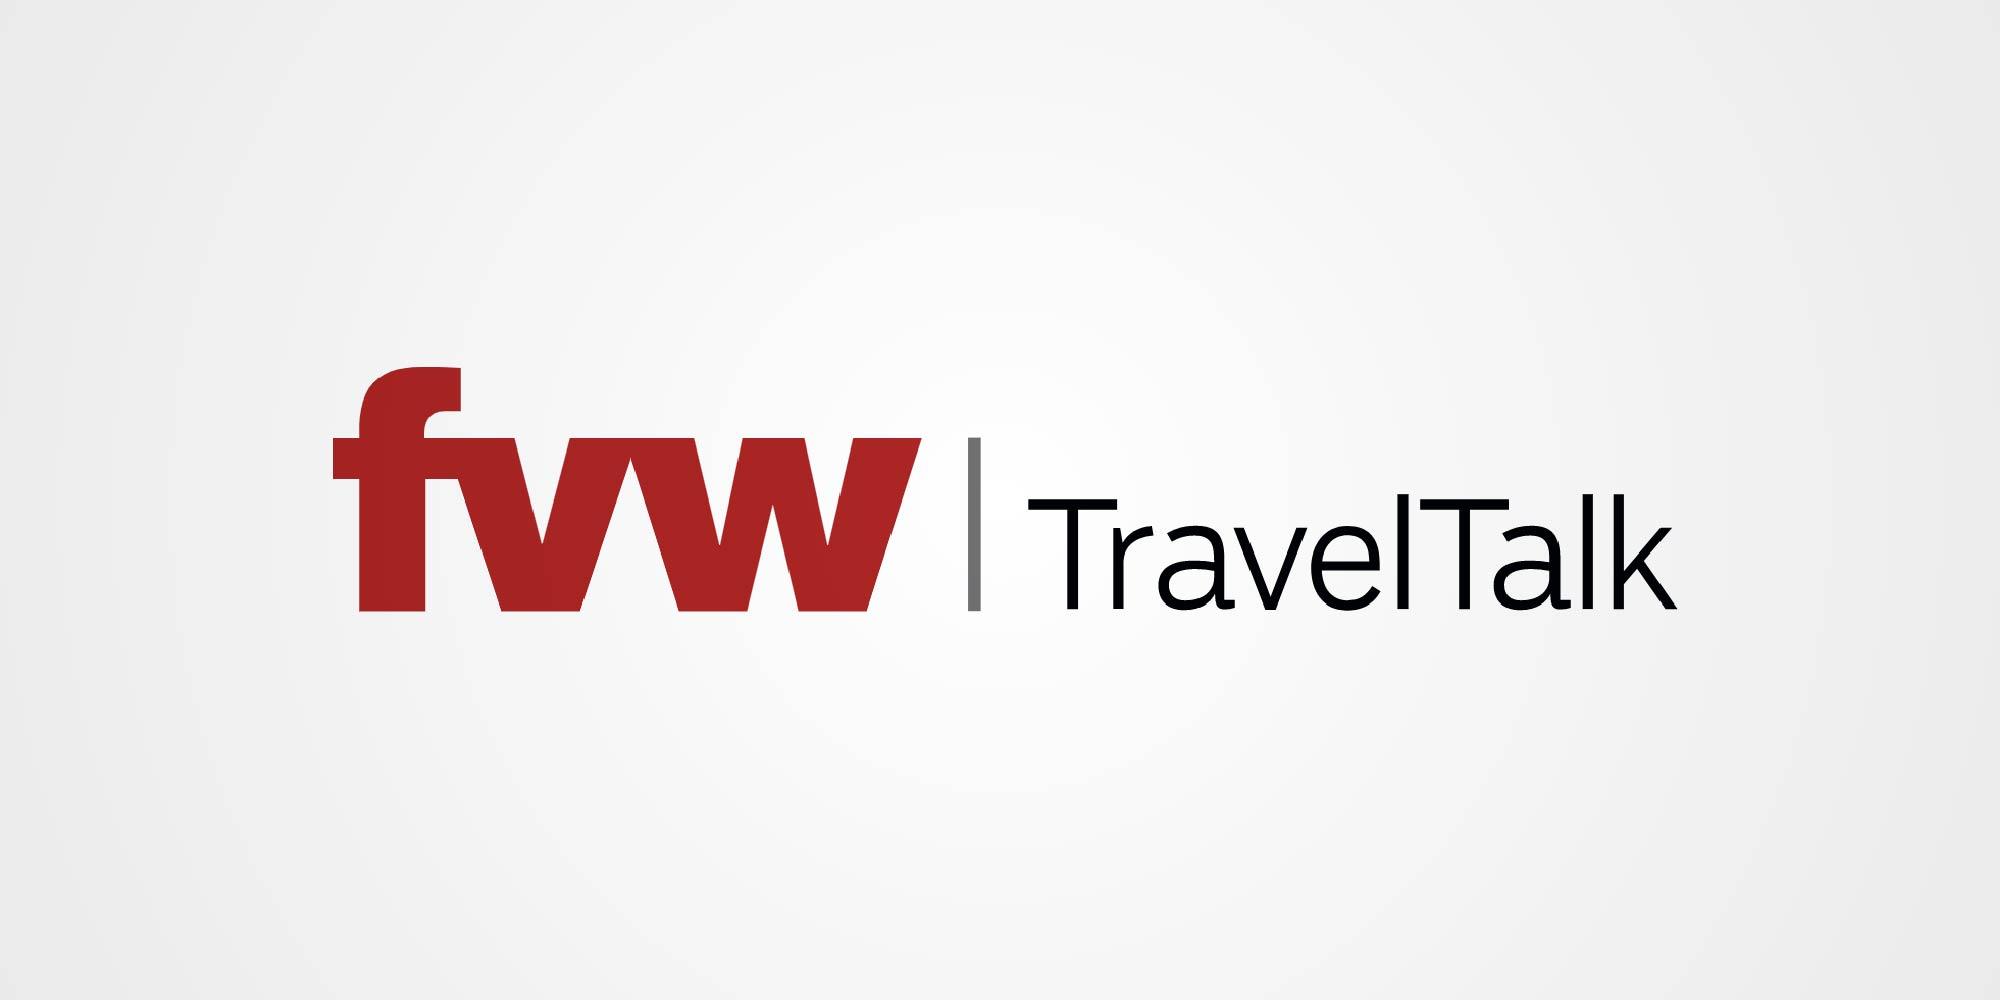 Decorative Image - FVW Travel Talk